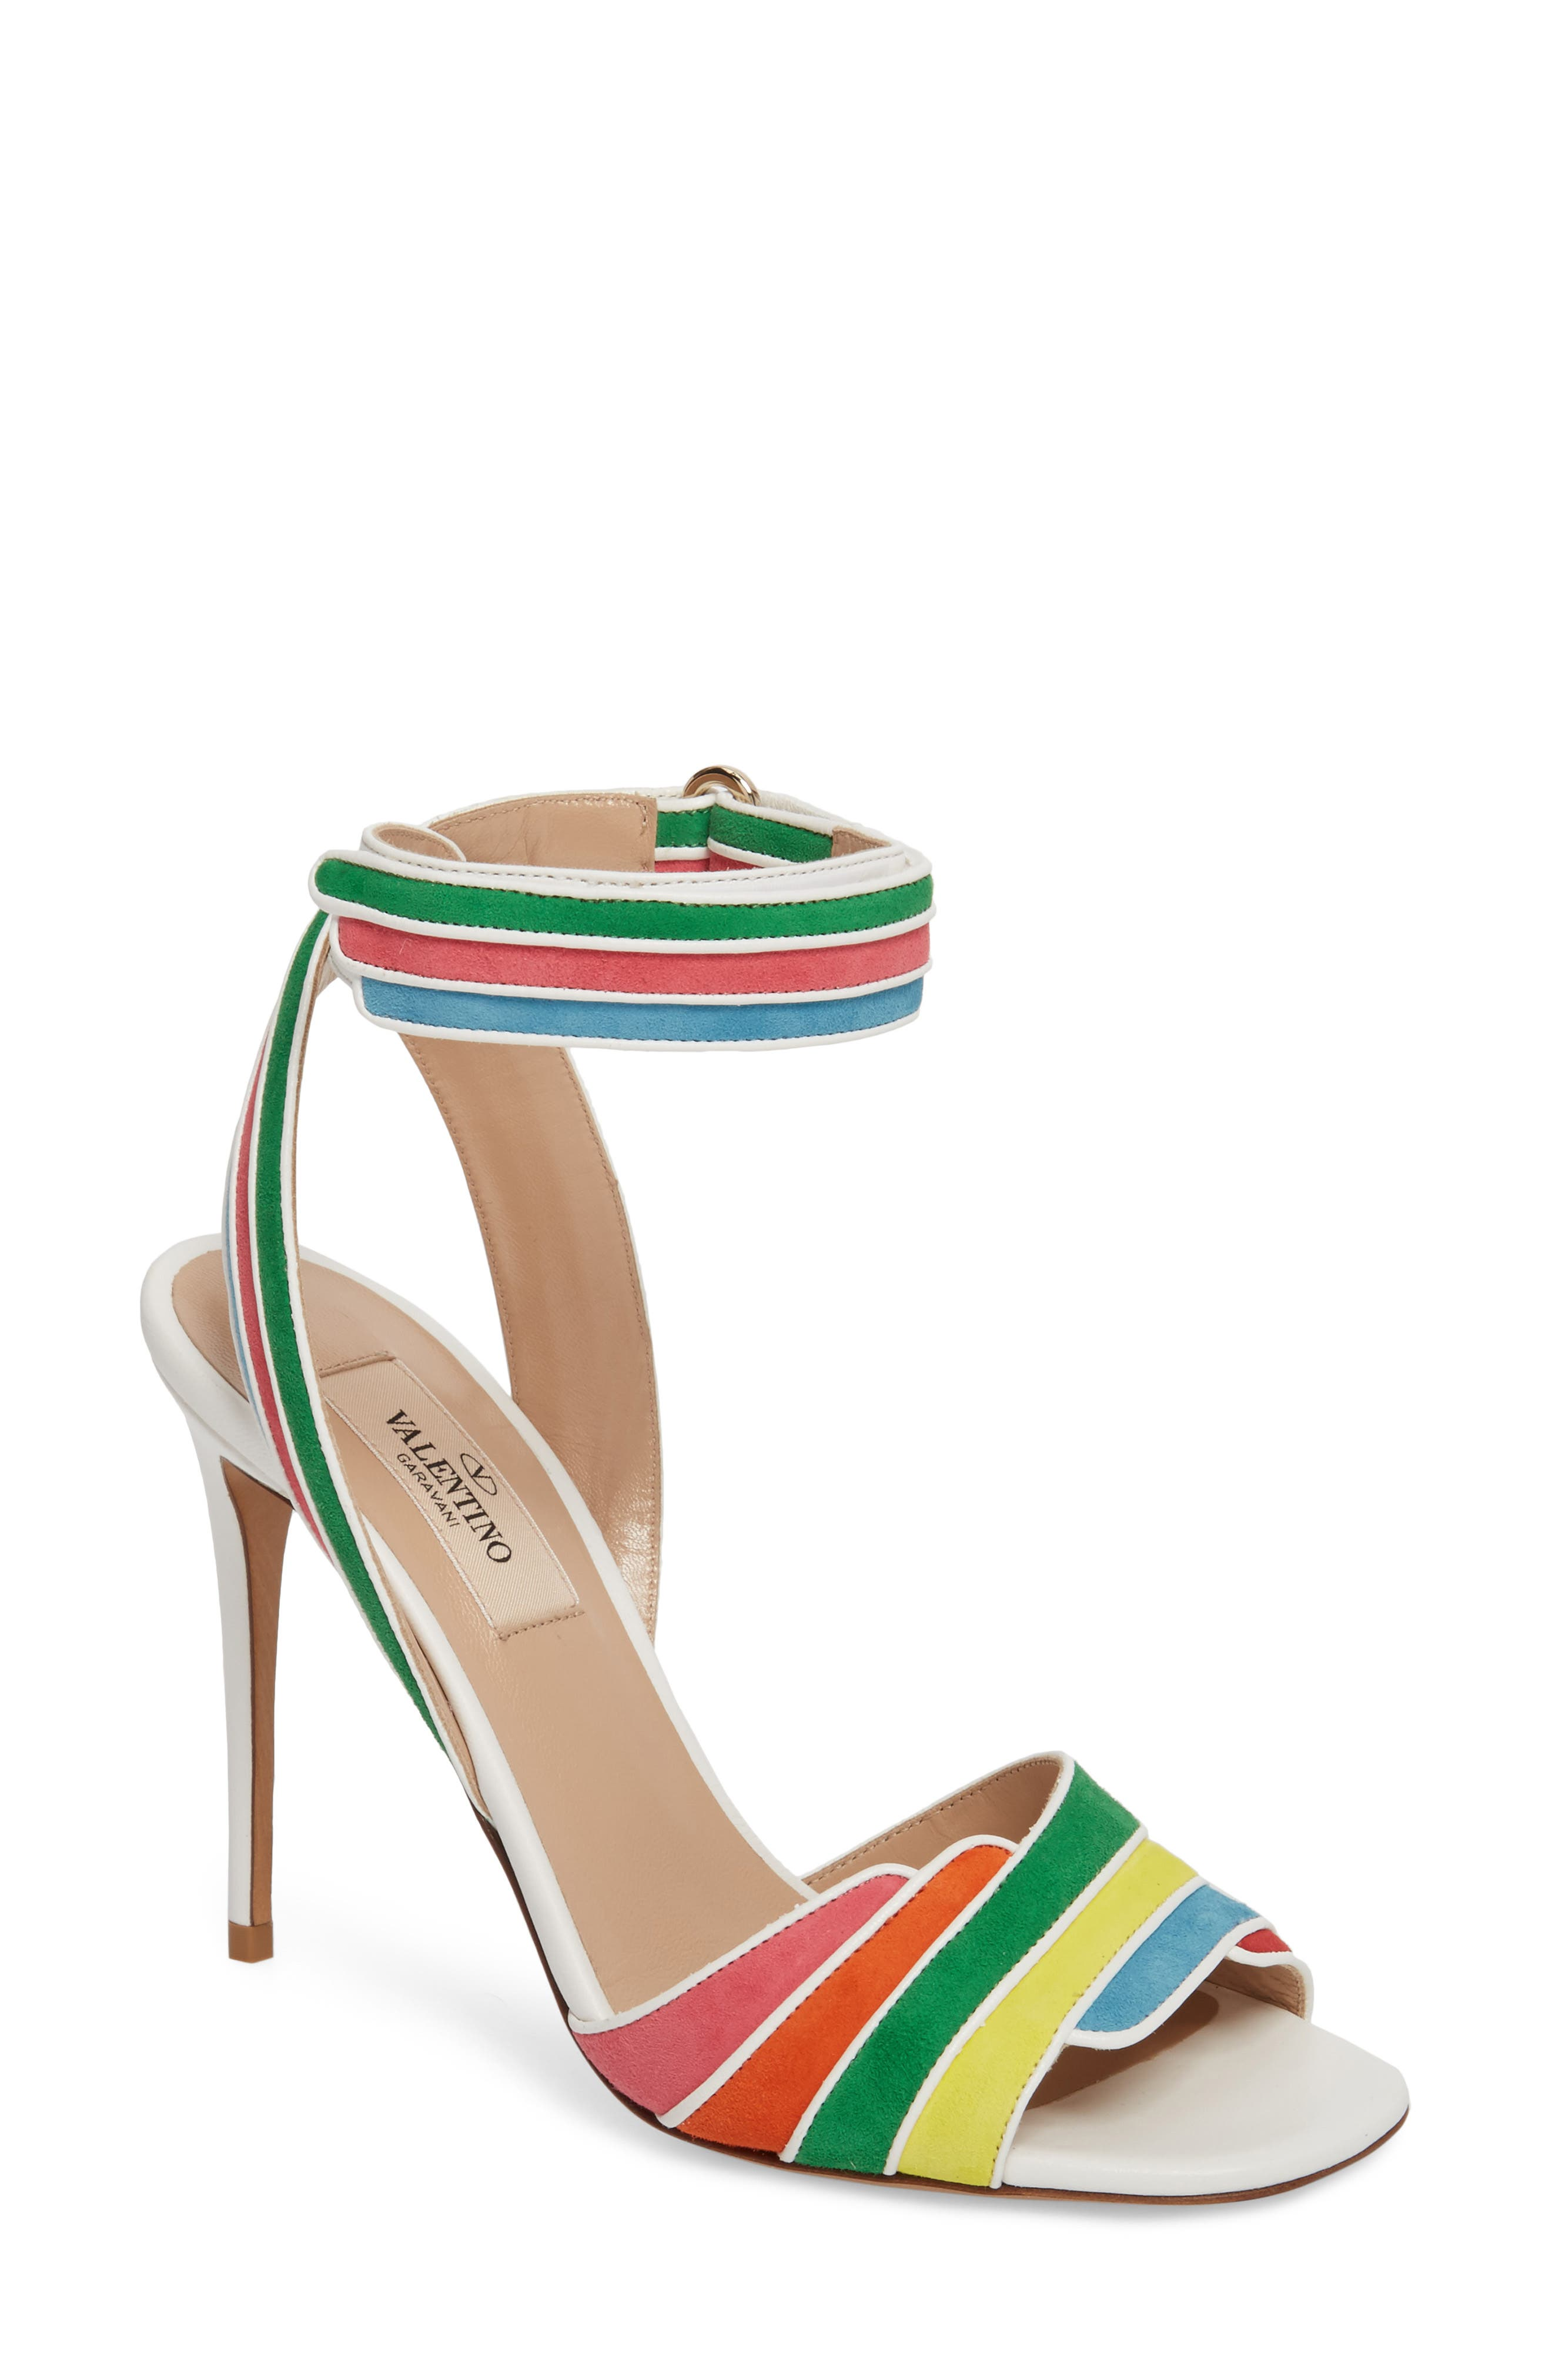 Main Image - VALENTINO GARAVANI Rainbow Sandal (Women)